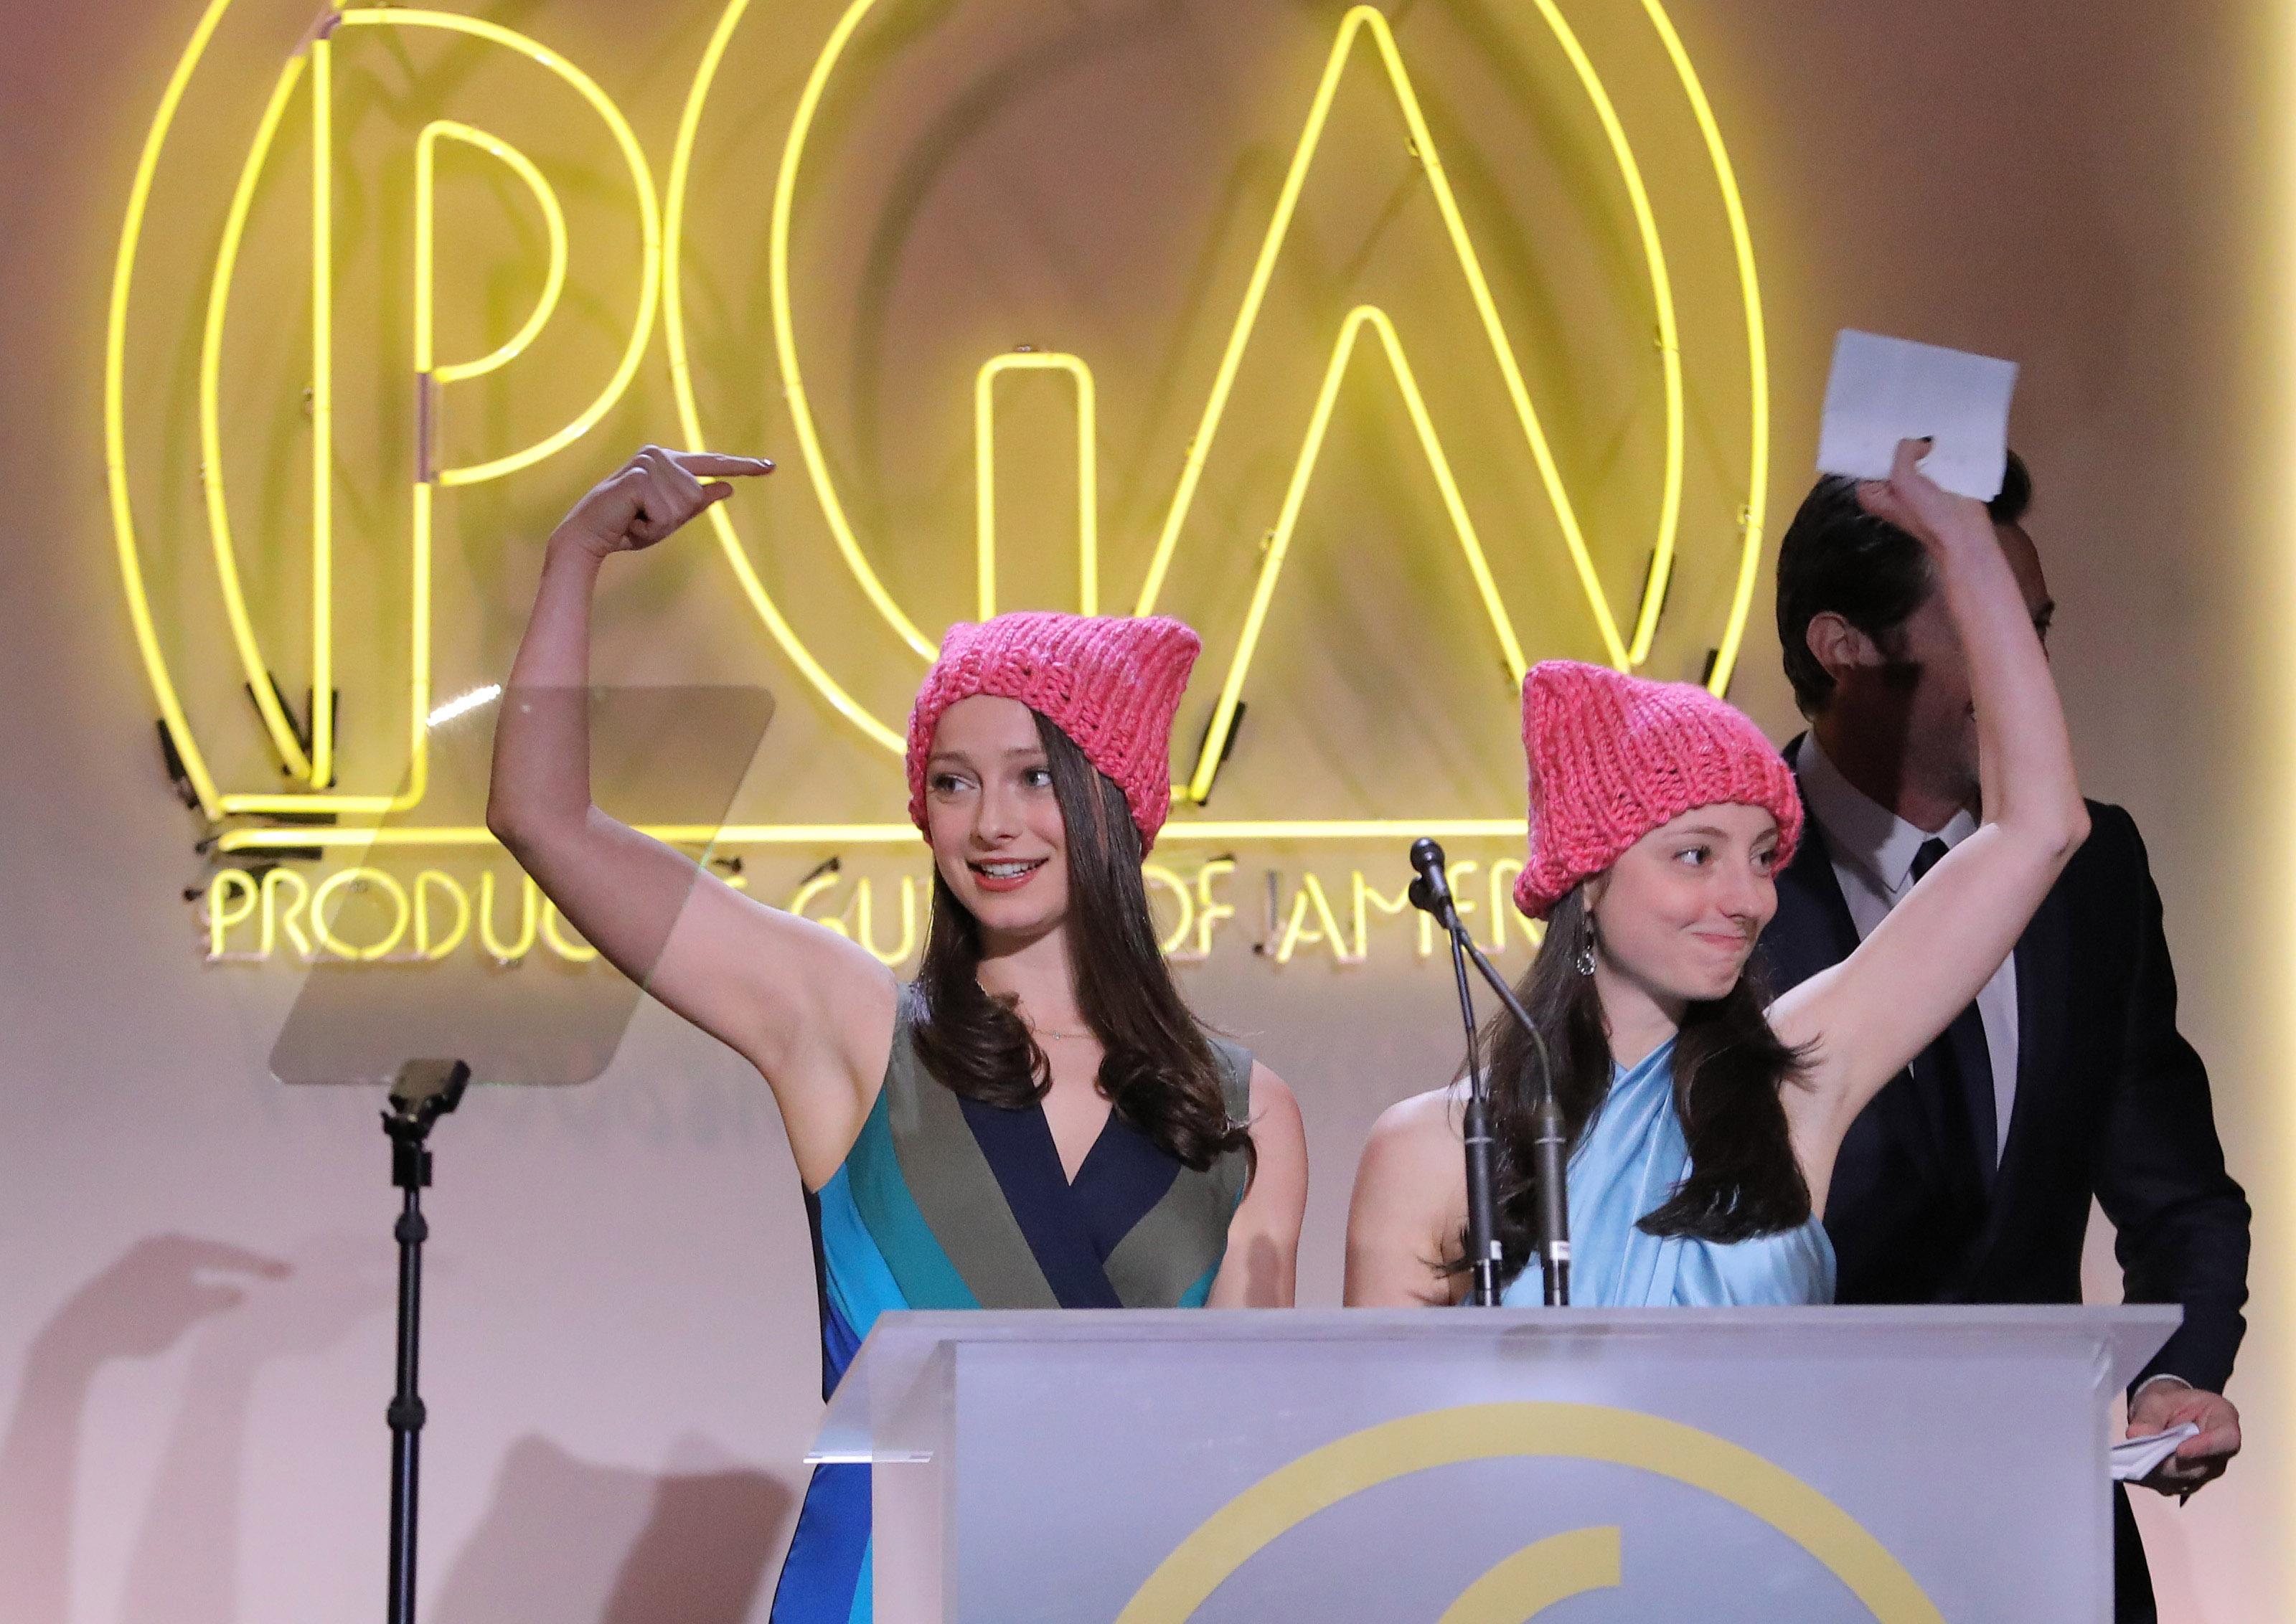 Producers Guild Awards, Inside, Los Angeles, USA - 28 Jan 2017